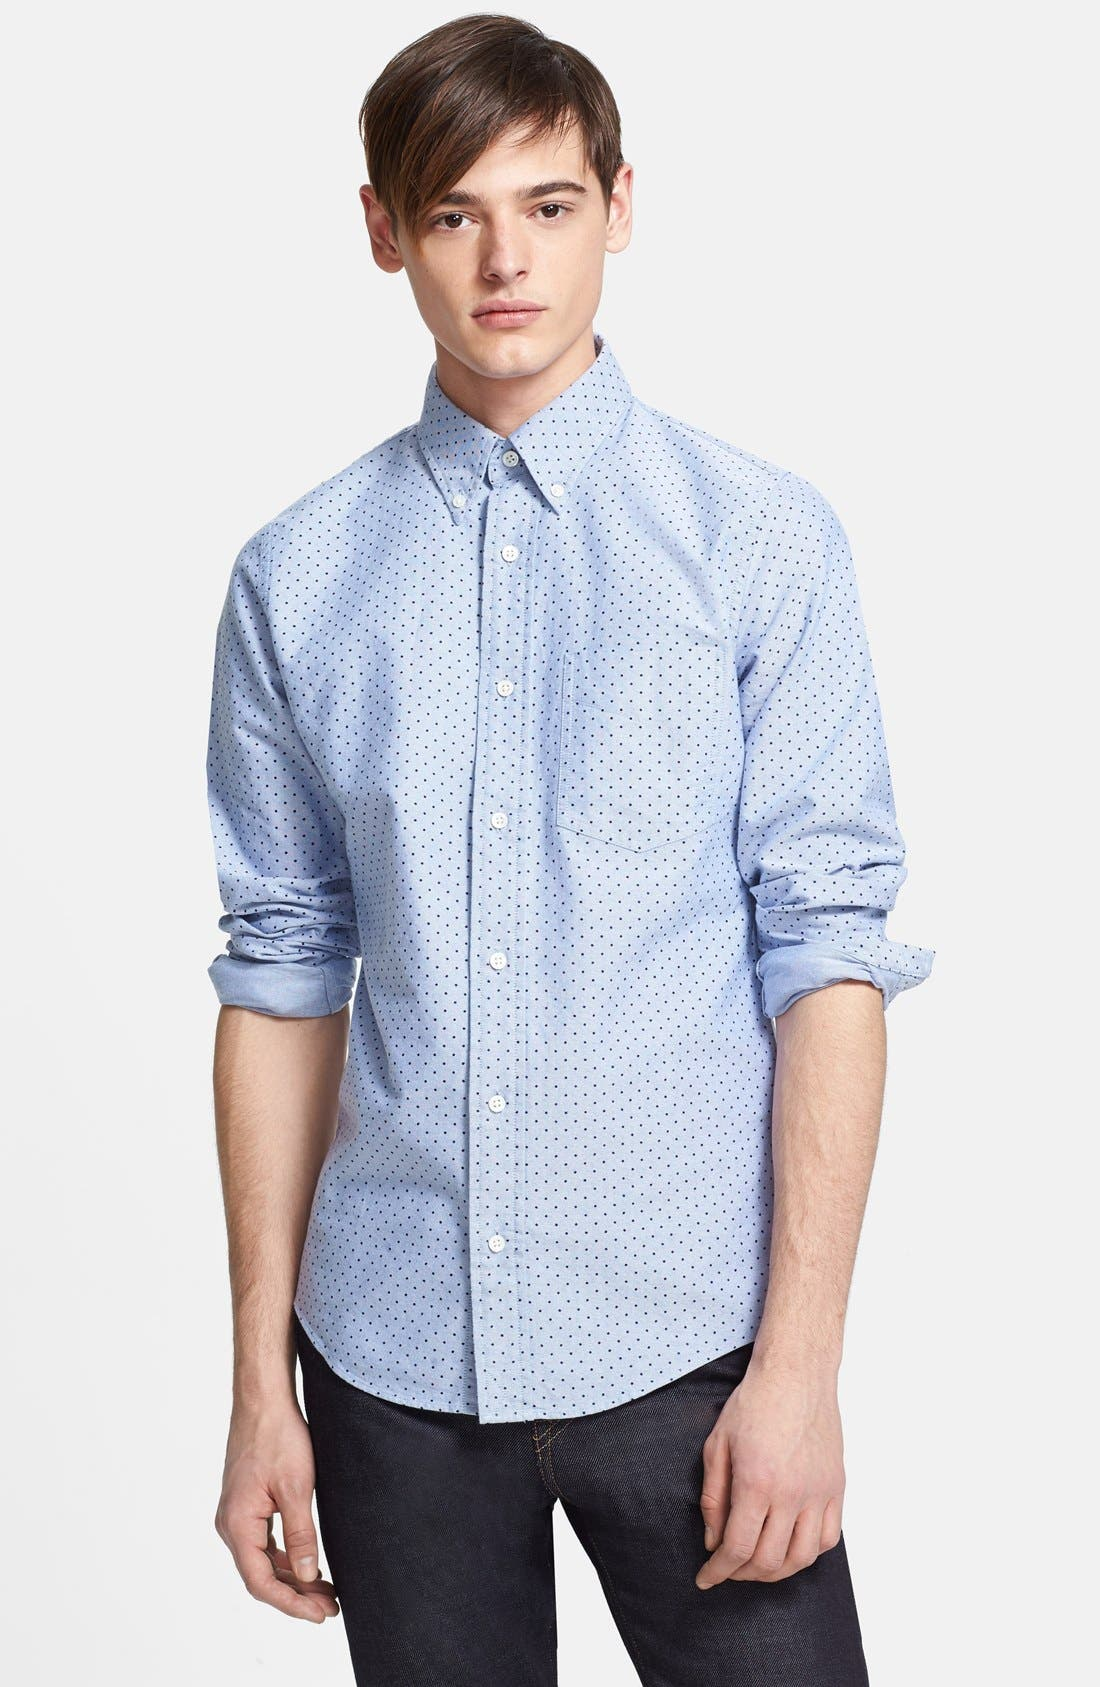 Alternate Image 1 Selected - Jack Spade 'Taylor' Dot Woven Oxford Sport Shirt